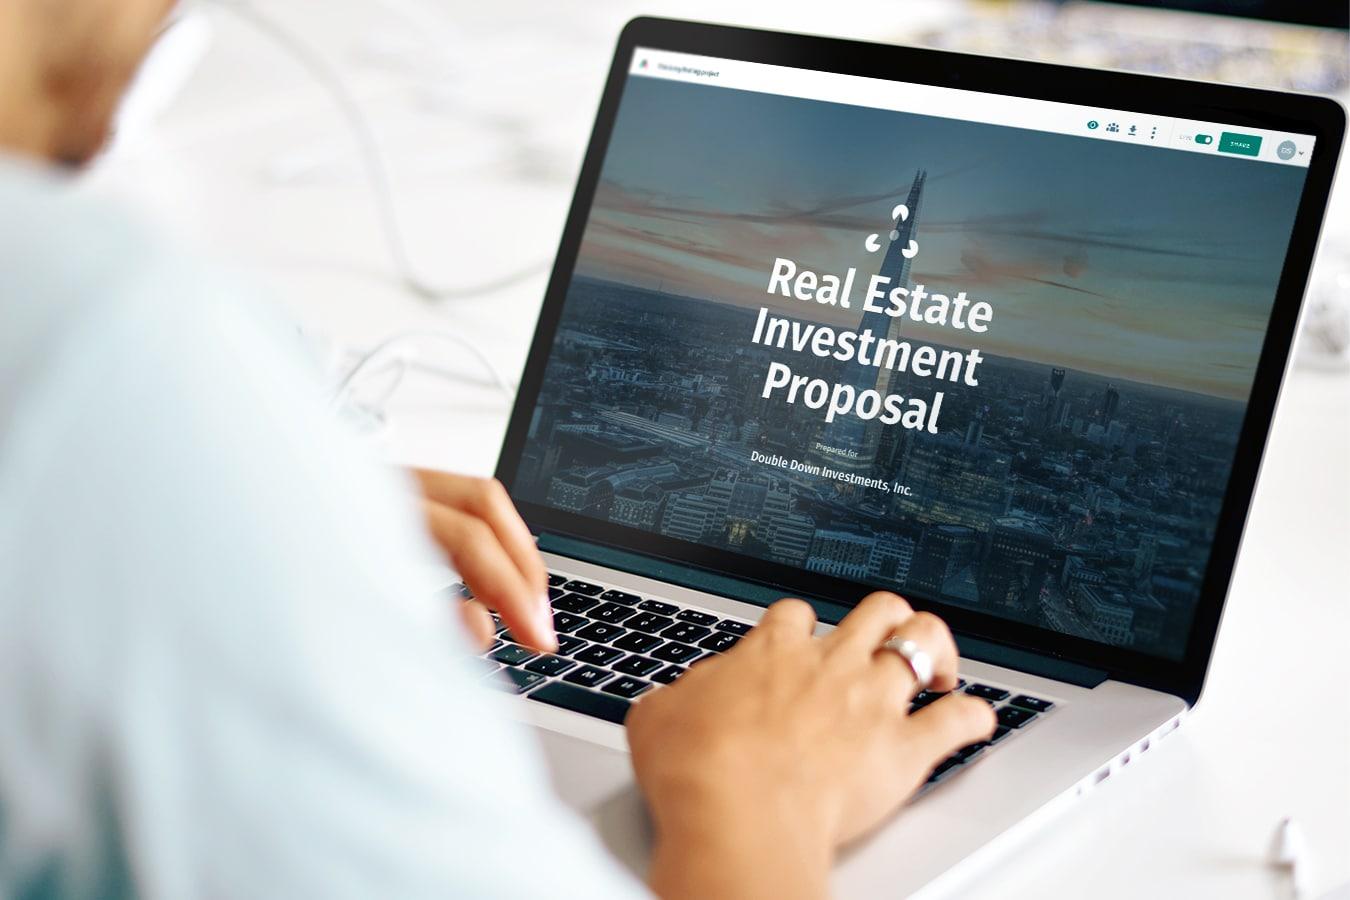 real-estate-investment-proposal-template-desktop